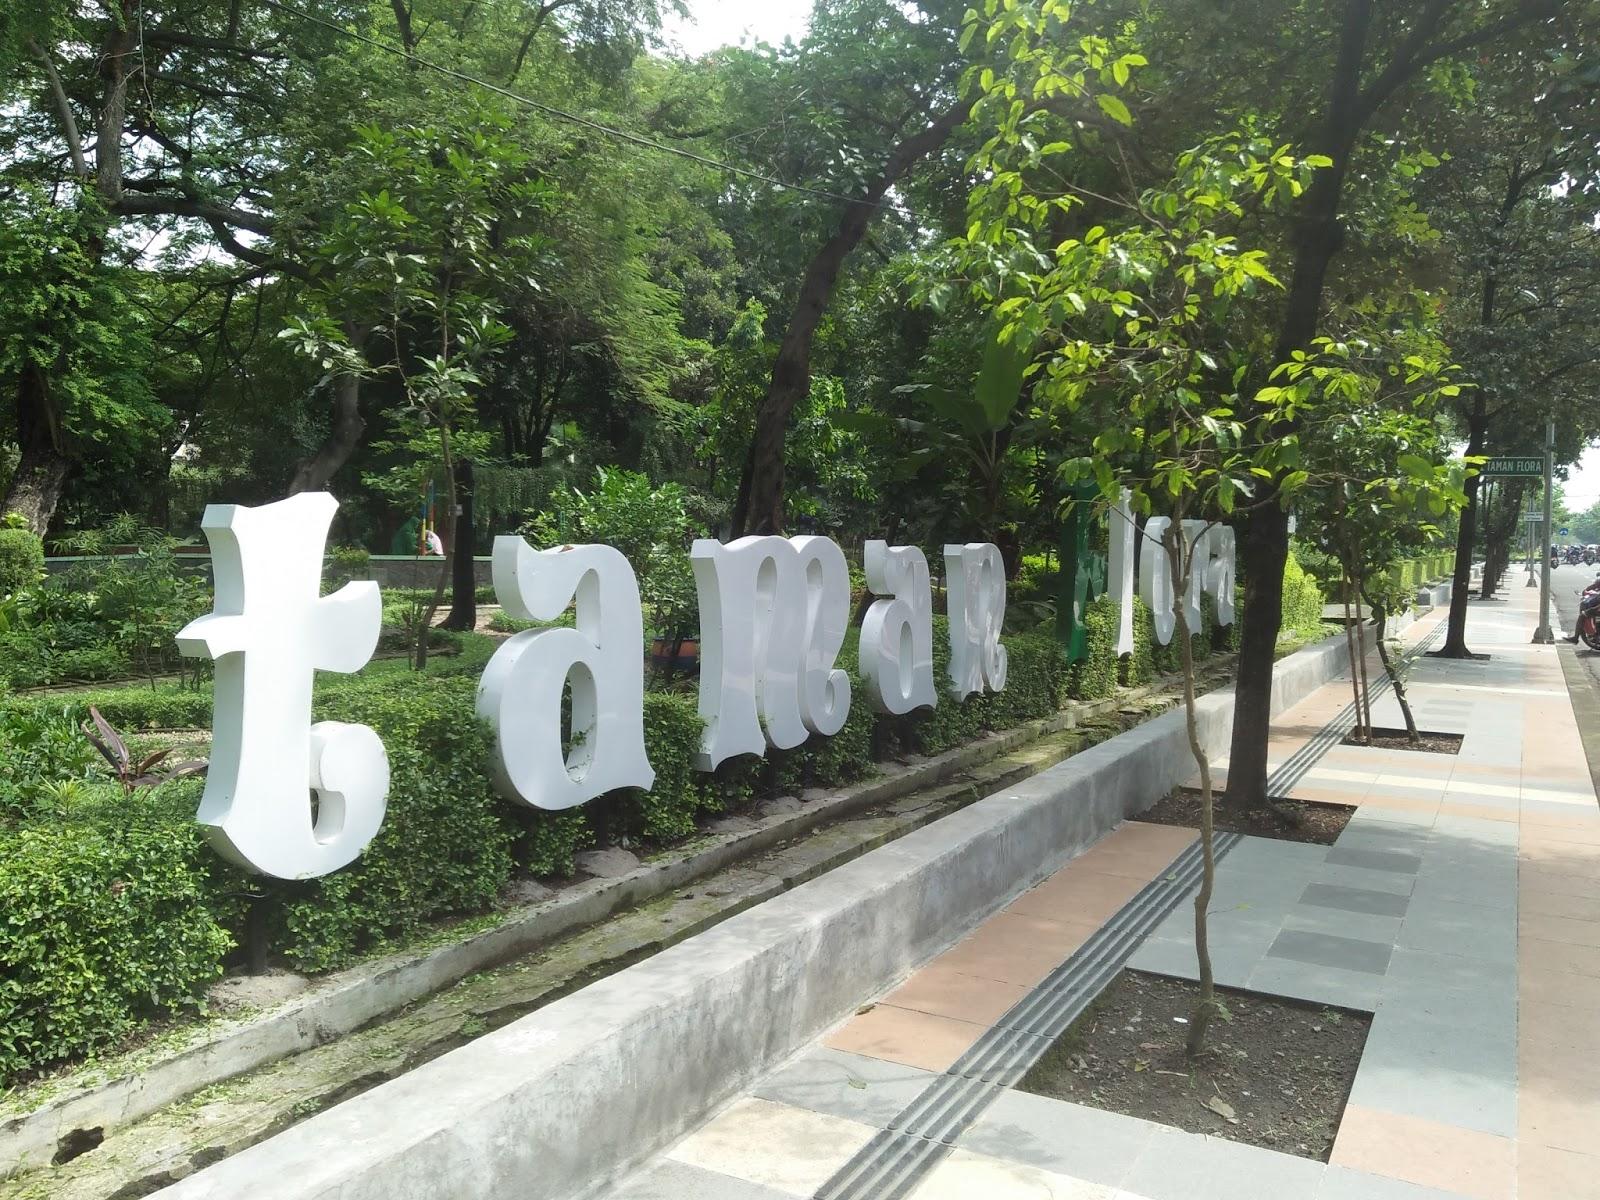 Keindaha Taman Bibit Surabaya Keindahan Flora Kebun Biasa Disebut Kota